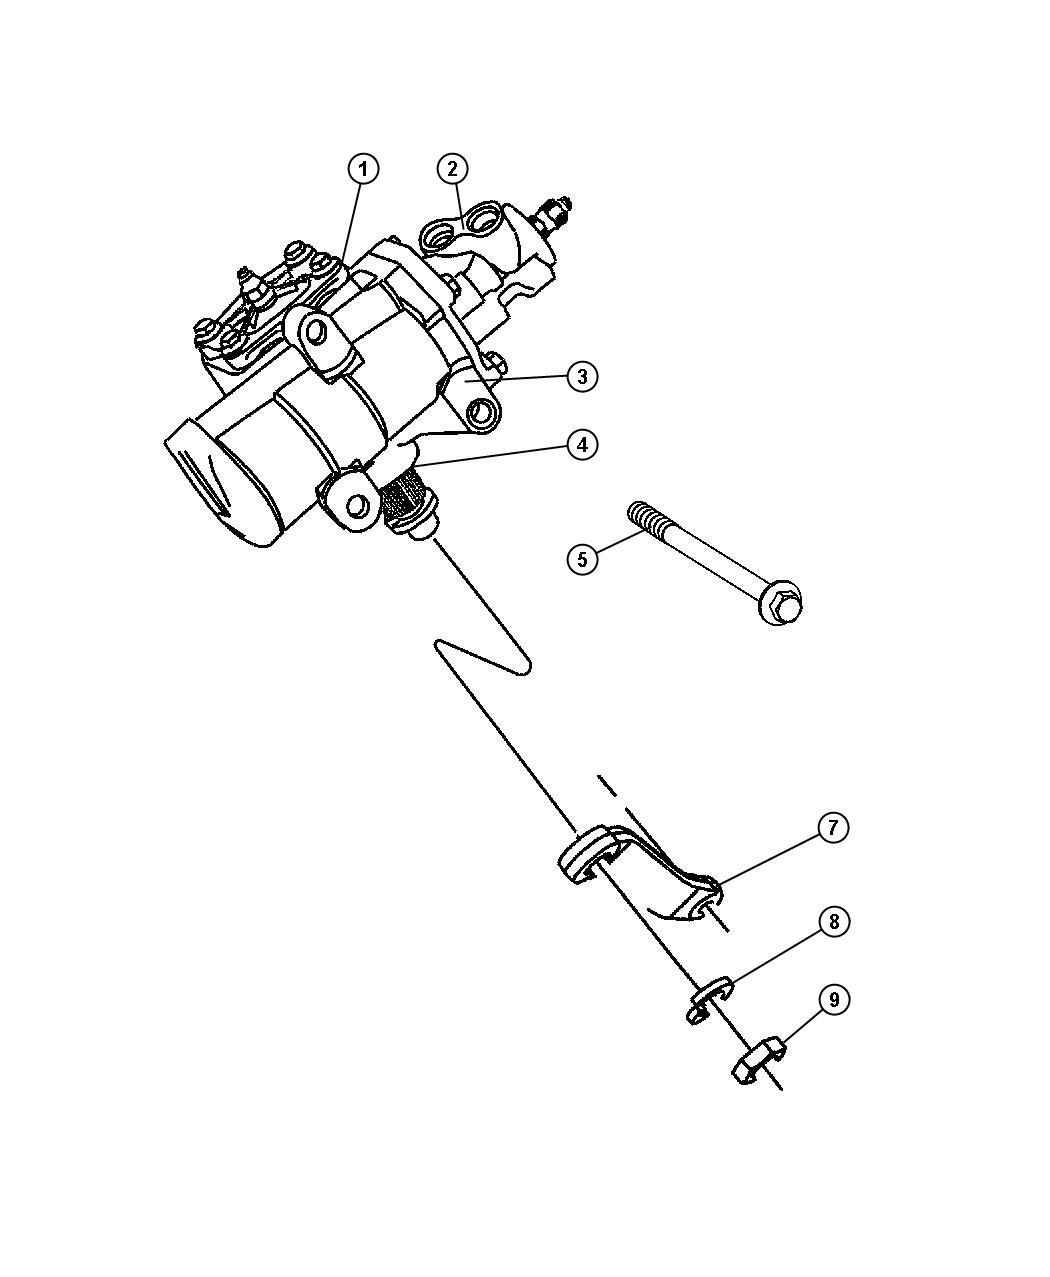 2003 dodge ram 2500 shaft  intermediate  partsdr  gearpower